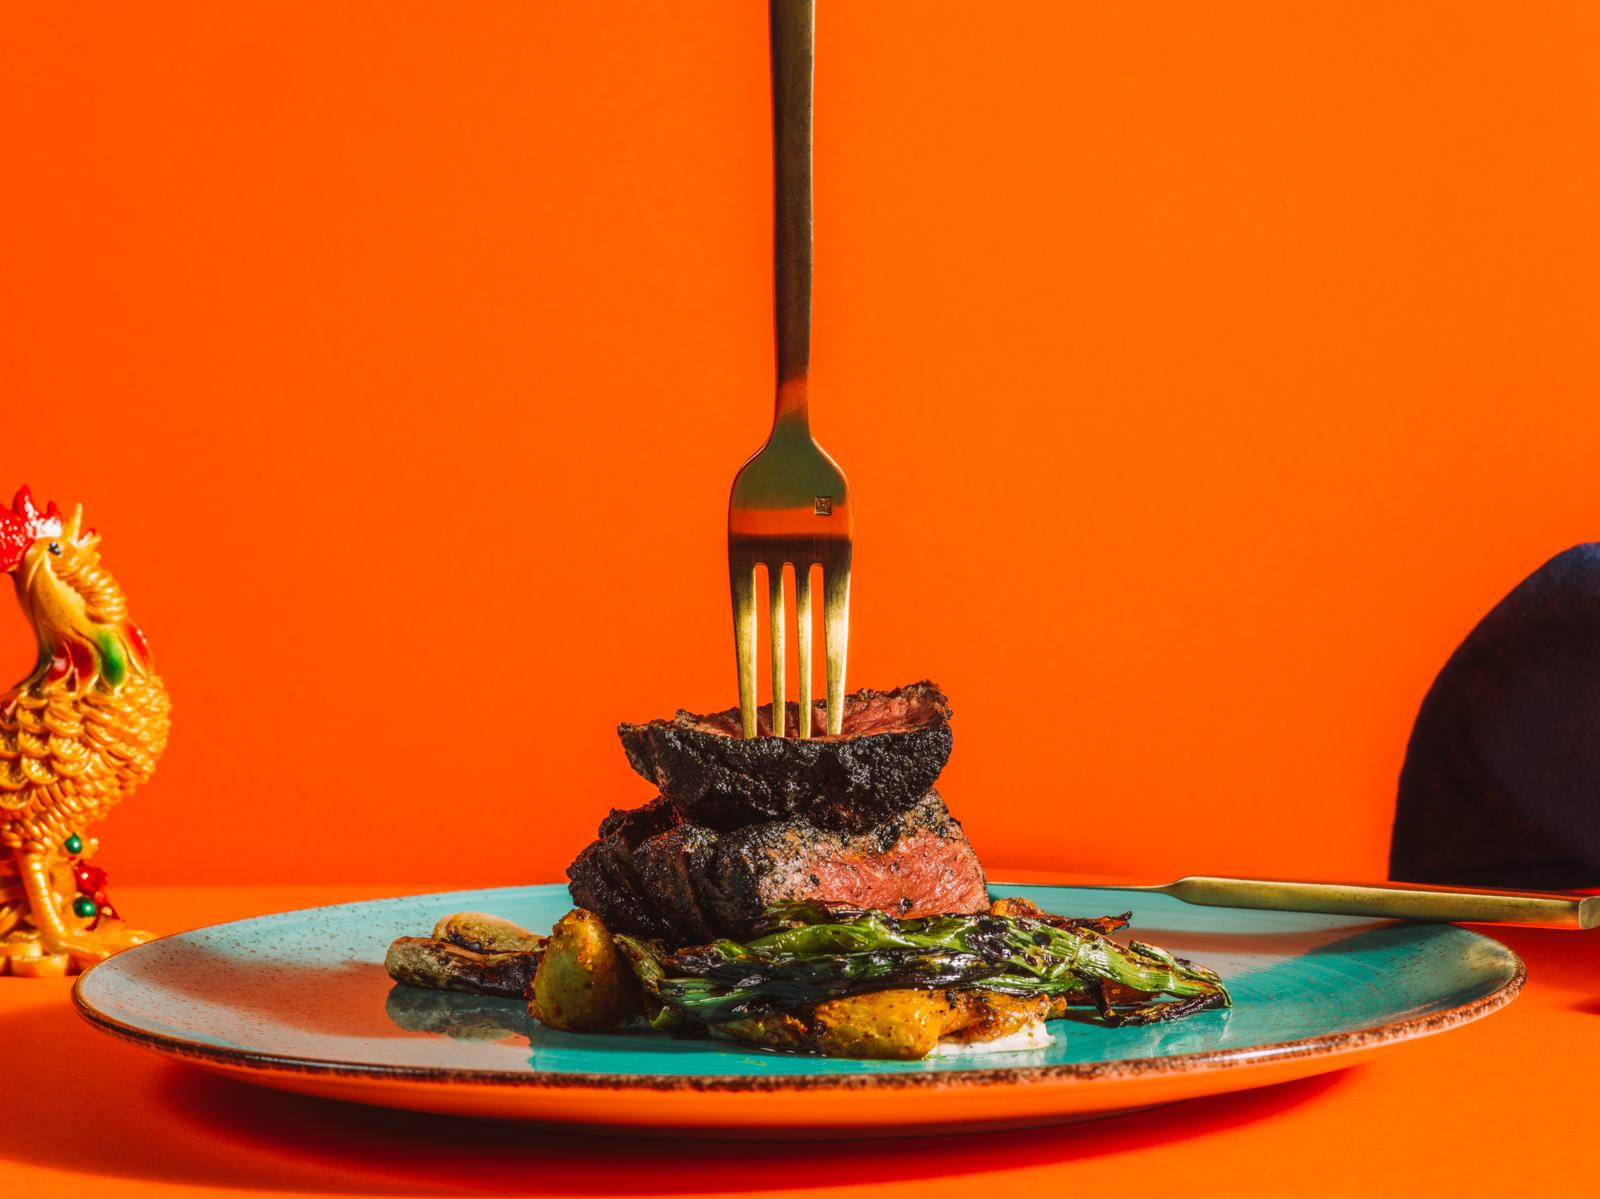 Rice-and-Gold-Food-All-Good-NYC-Nick-Johnson-Photography-23.JPG